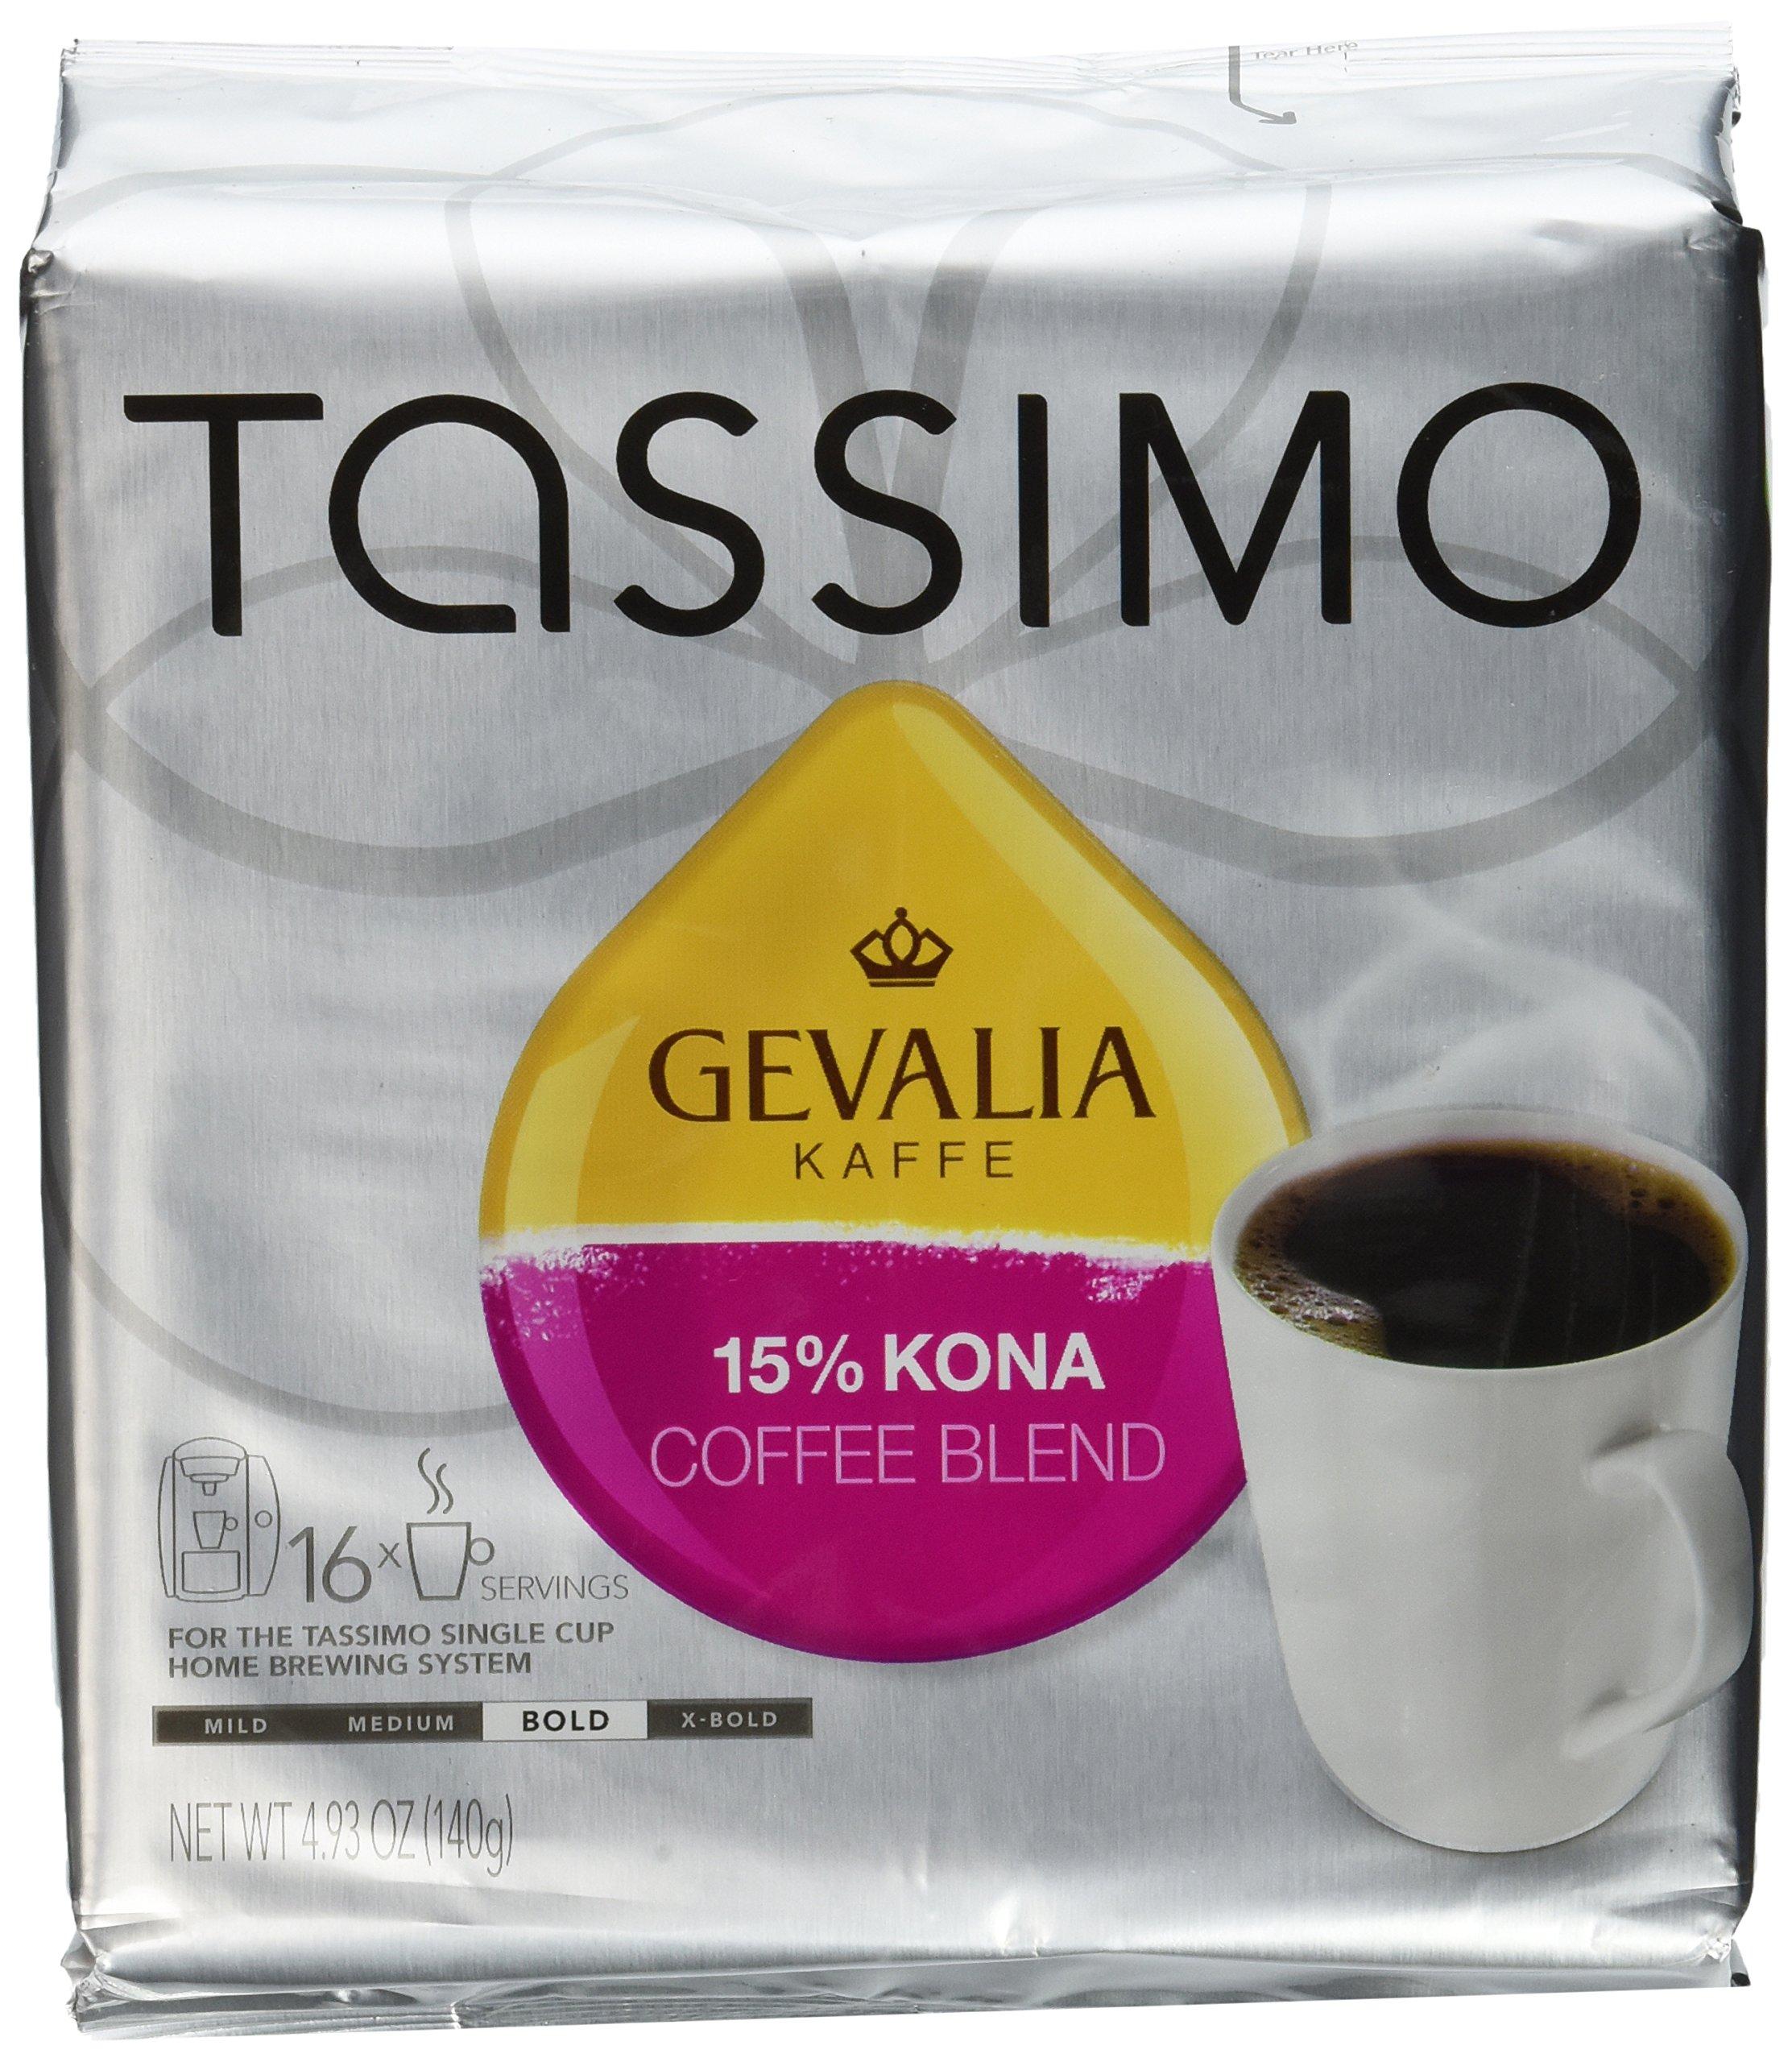 Gevalia Kaffe 15% Kona Blend Coffee (Pack of 2) by Gevalia